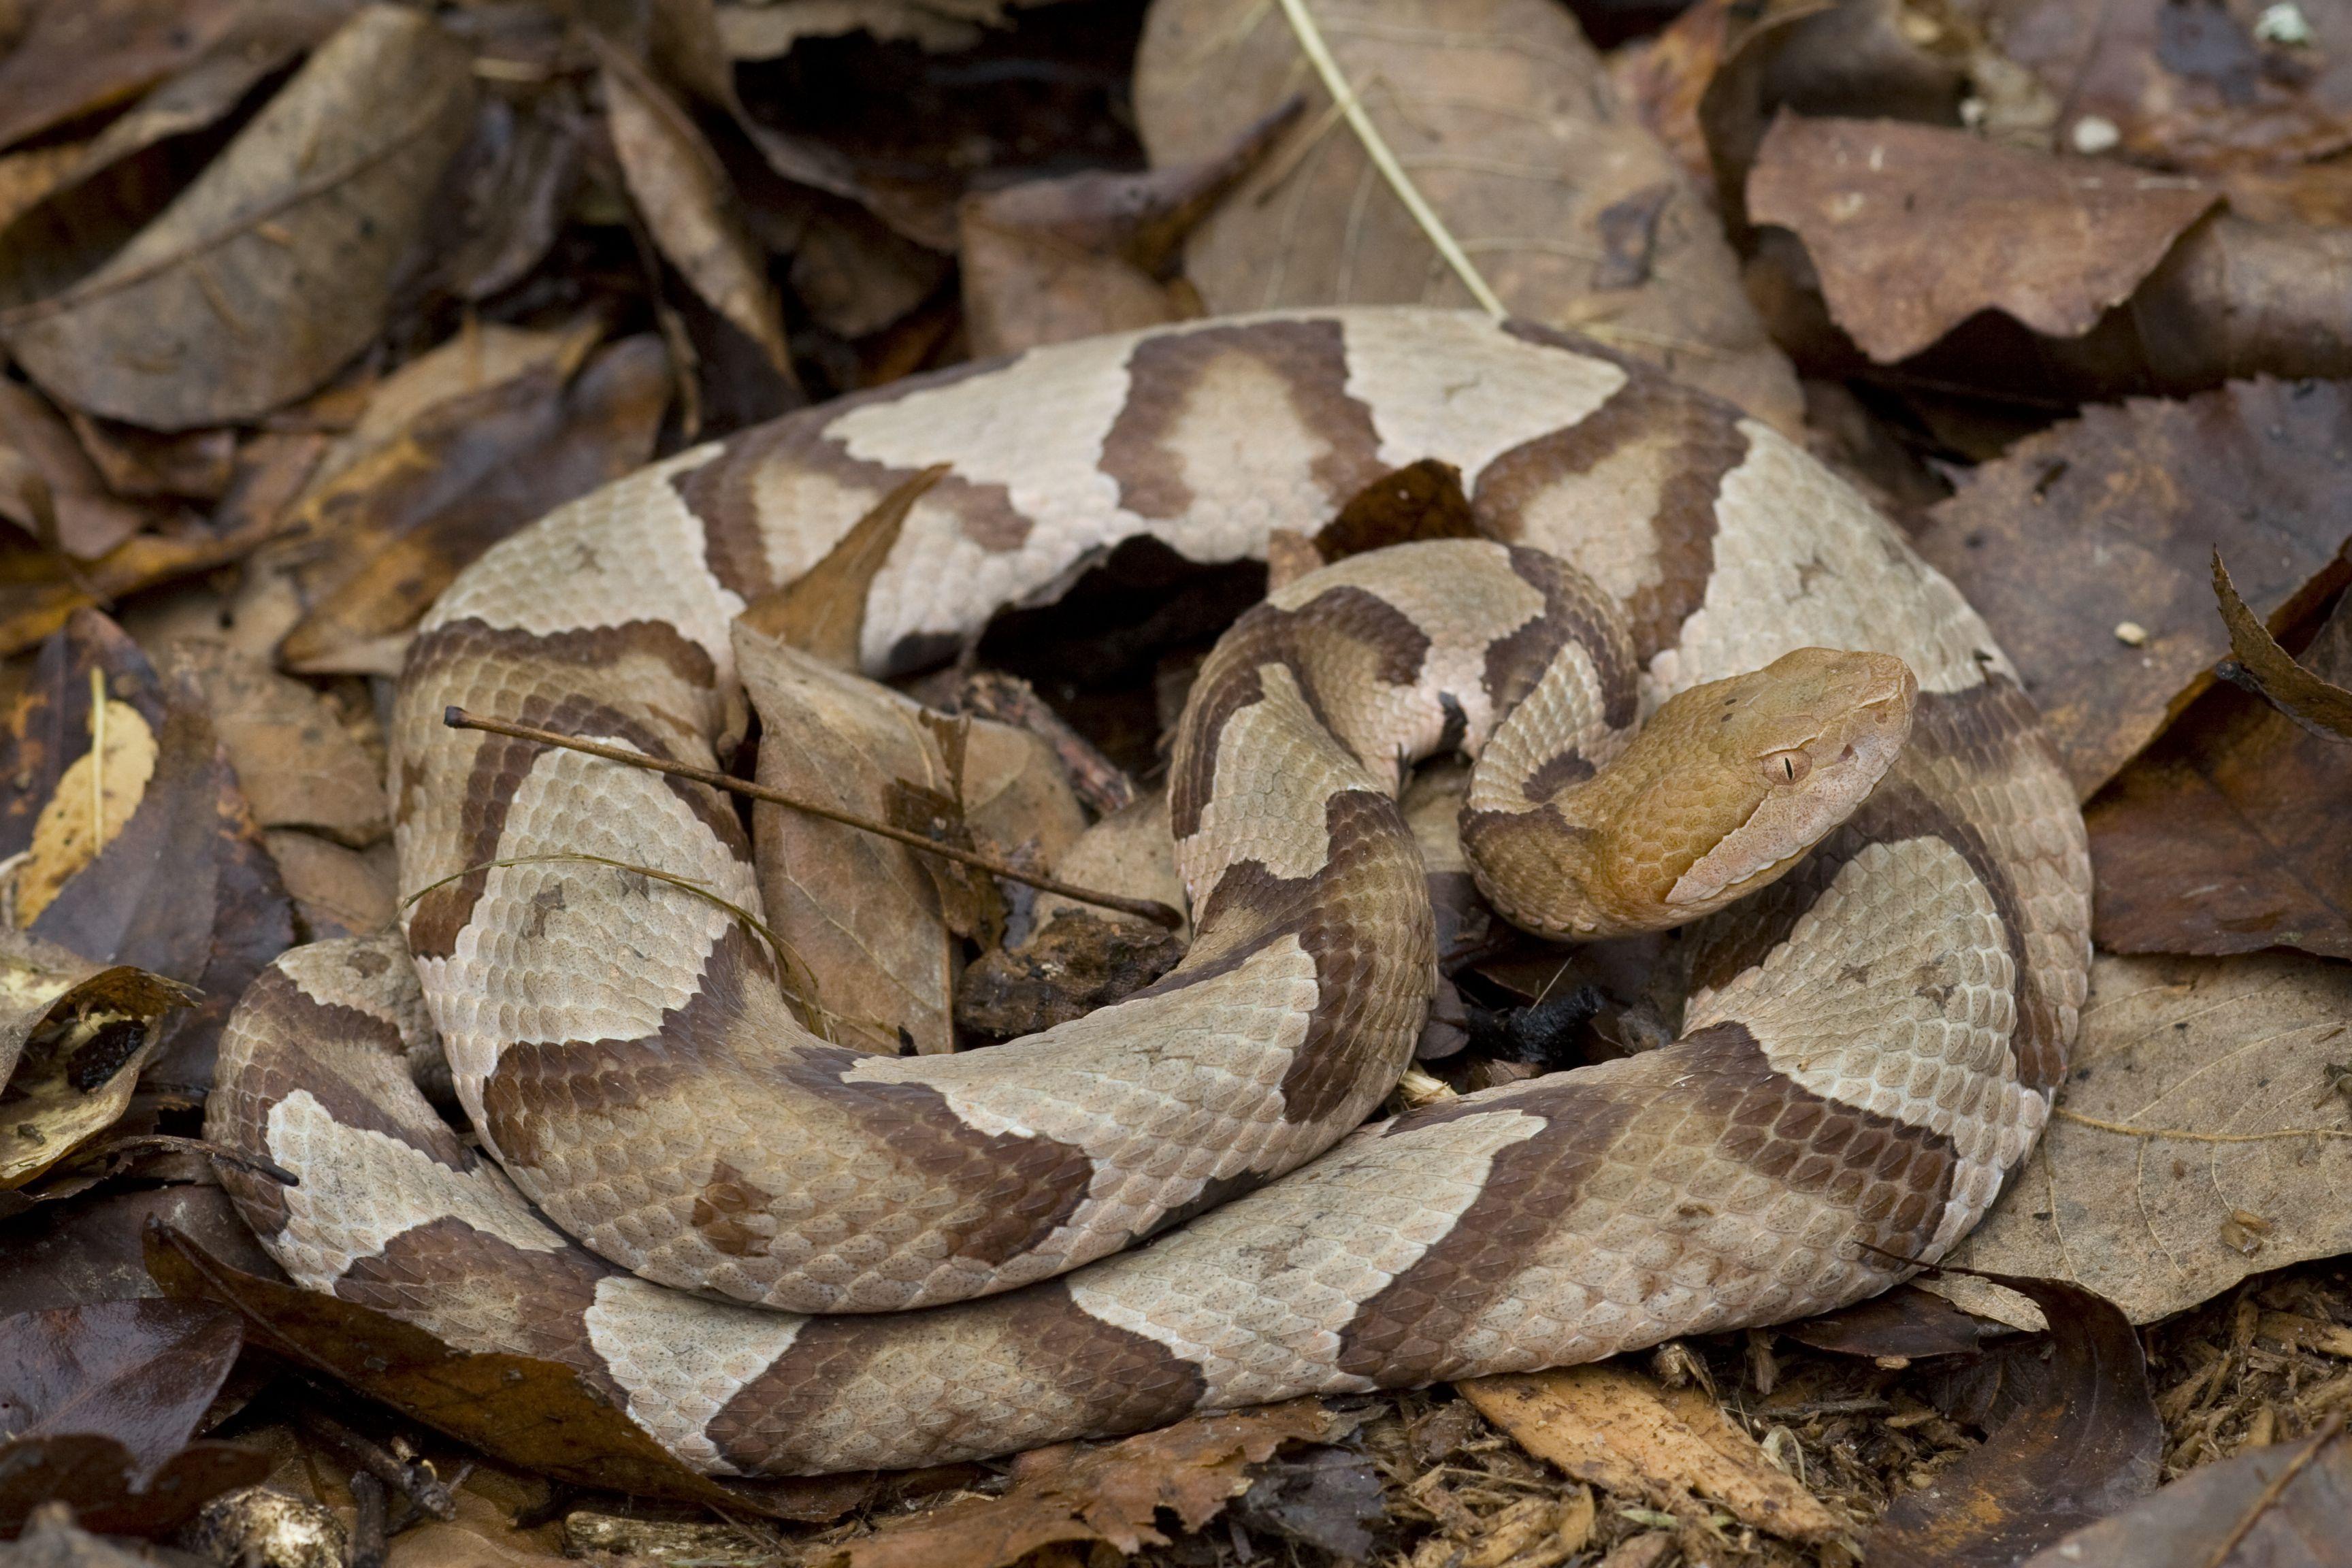 venomous copperhead snakeagkistrodon contortrix